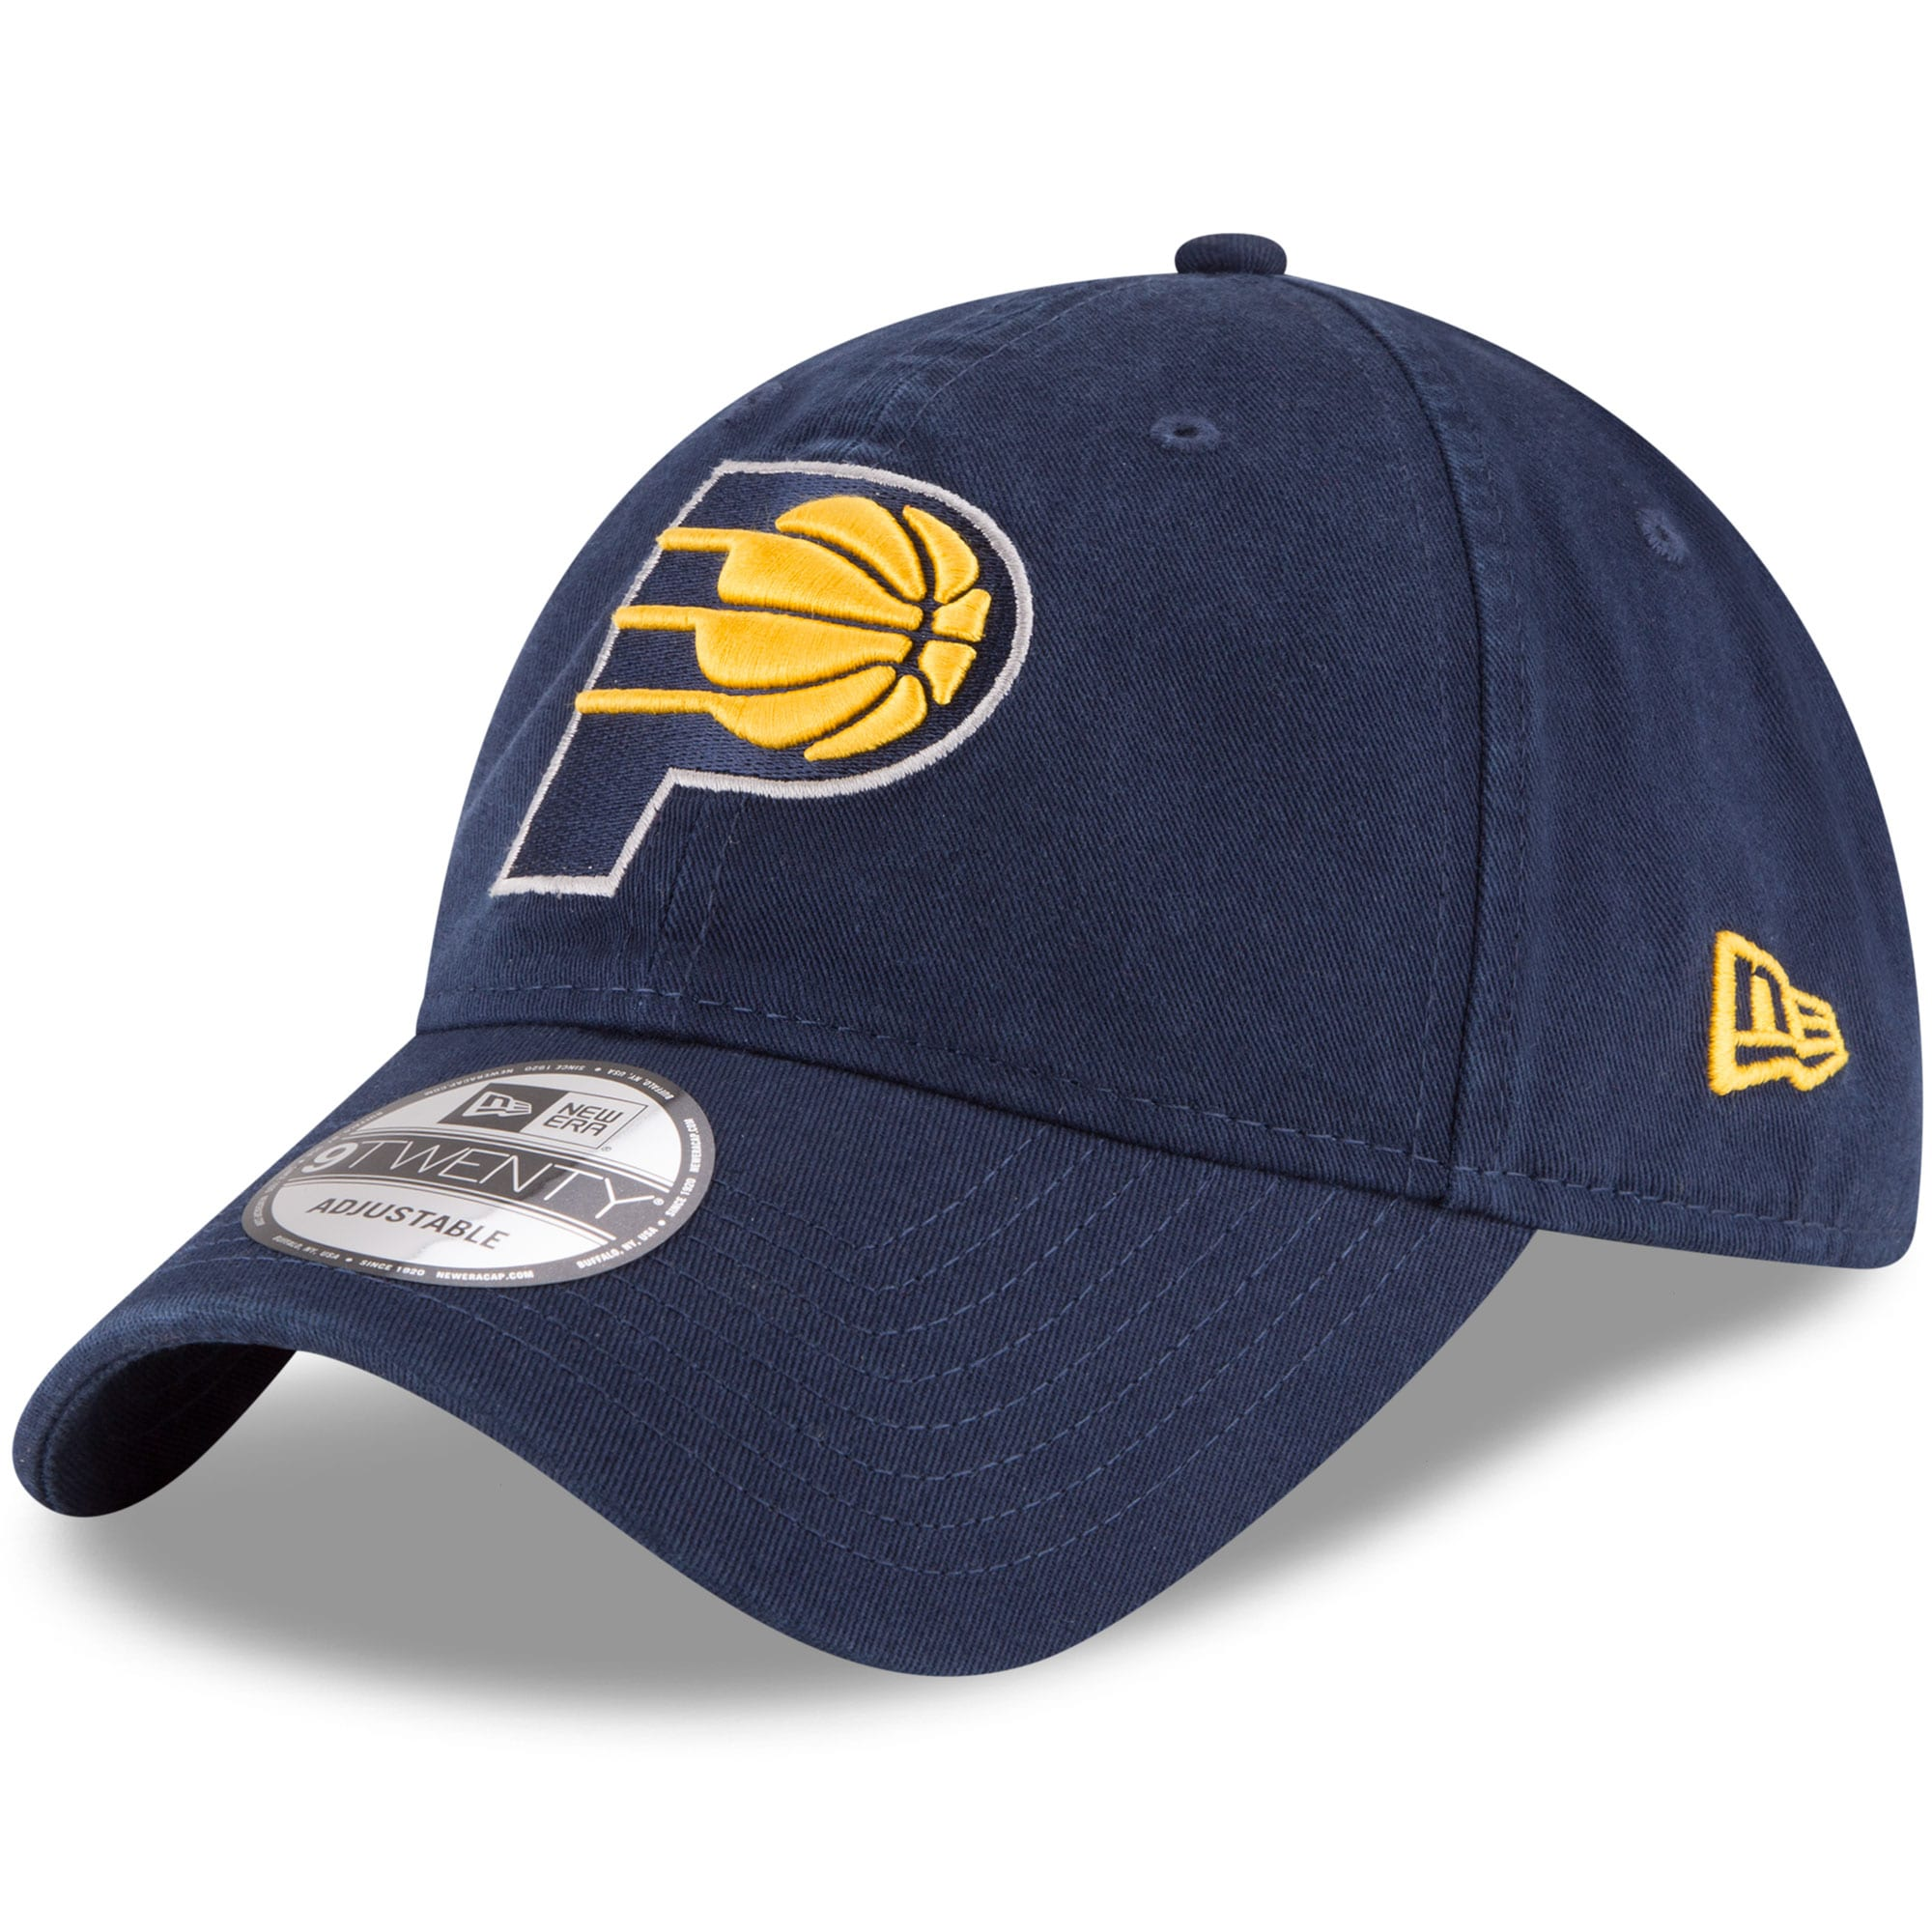 Indiana Pacers New Era Official Team Color 9TWENTY Adjustable Hat - Navy